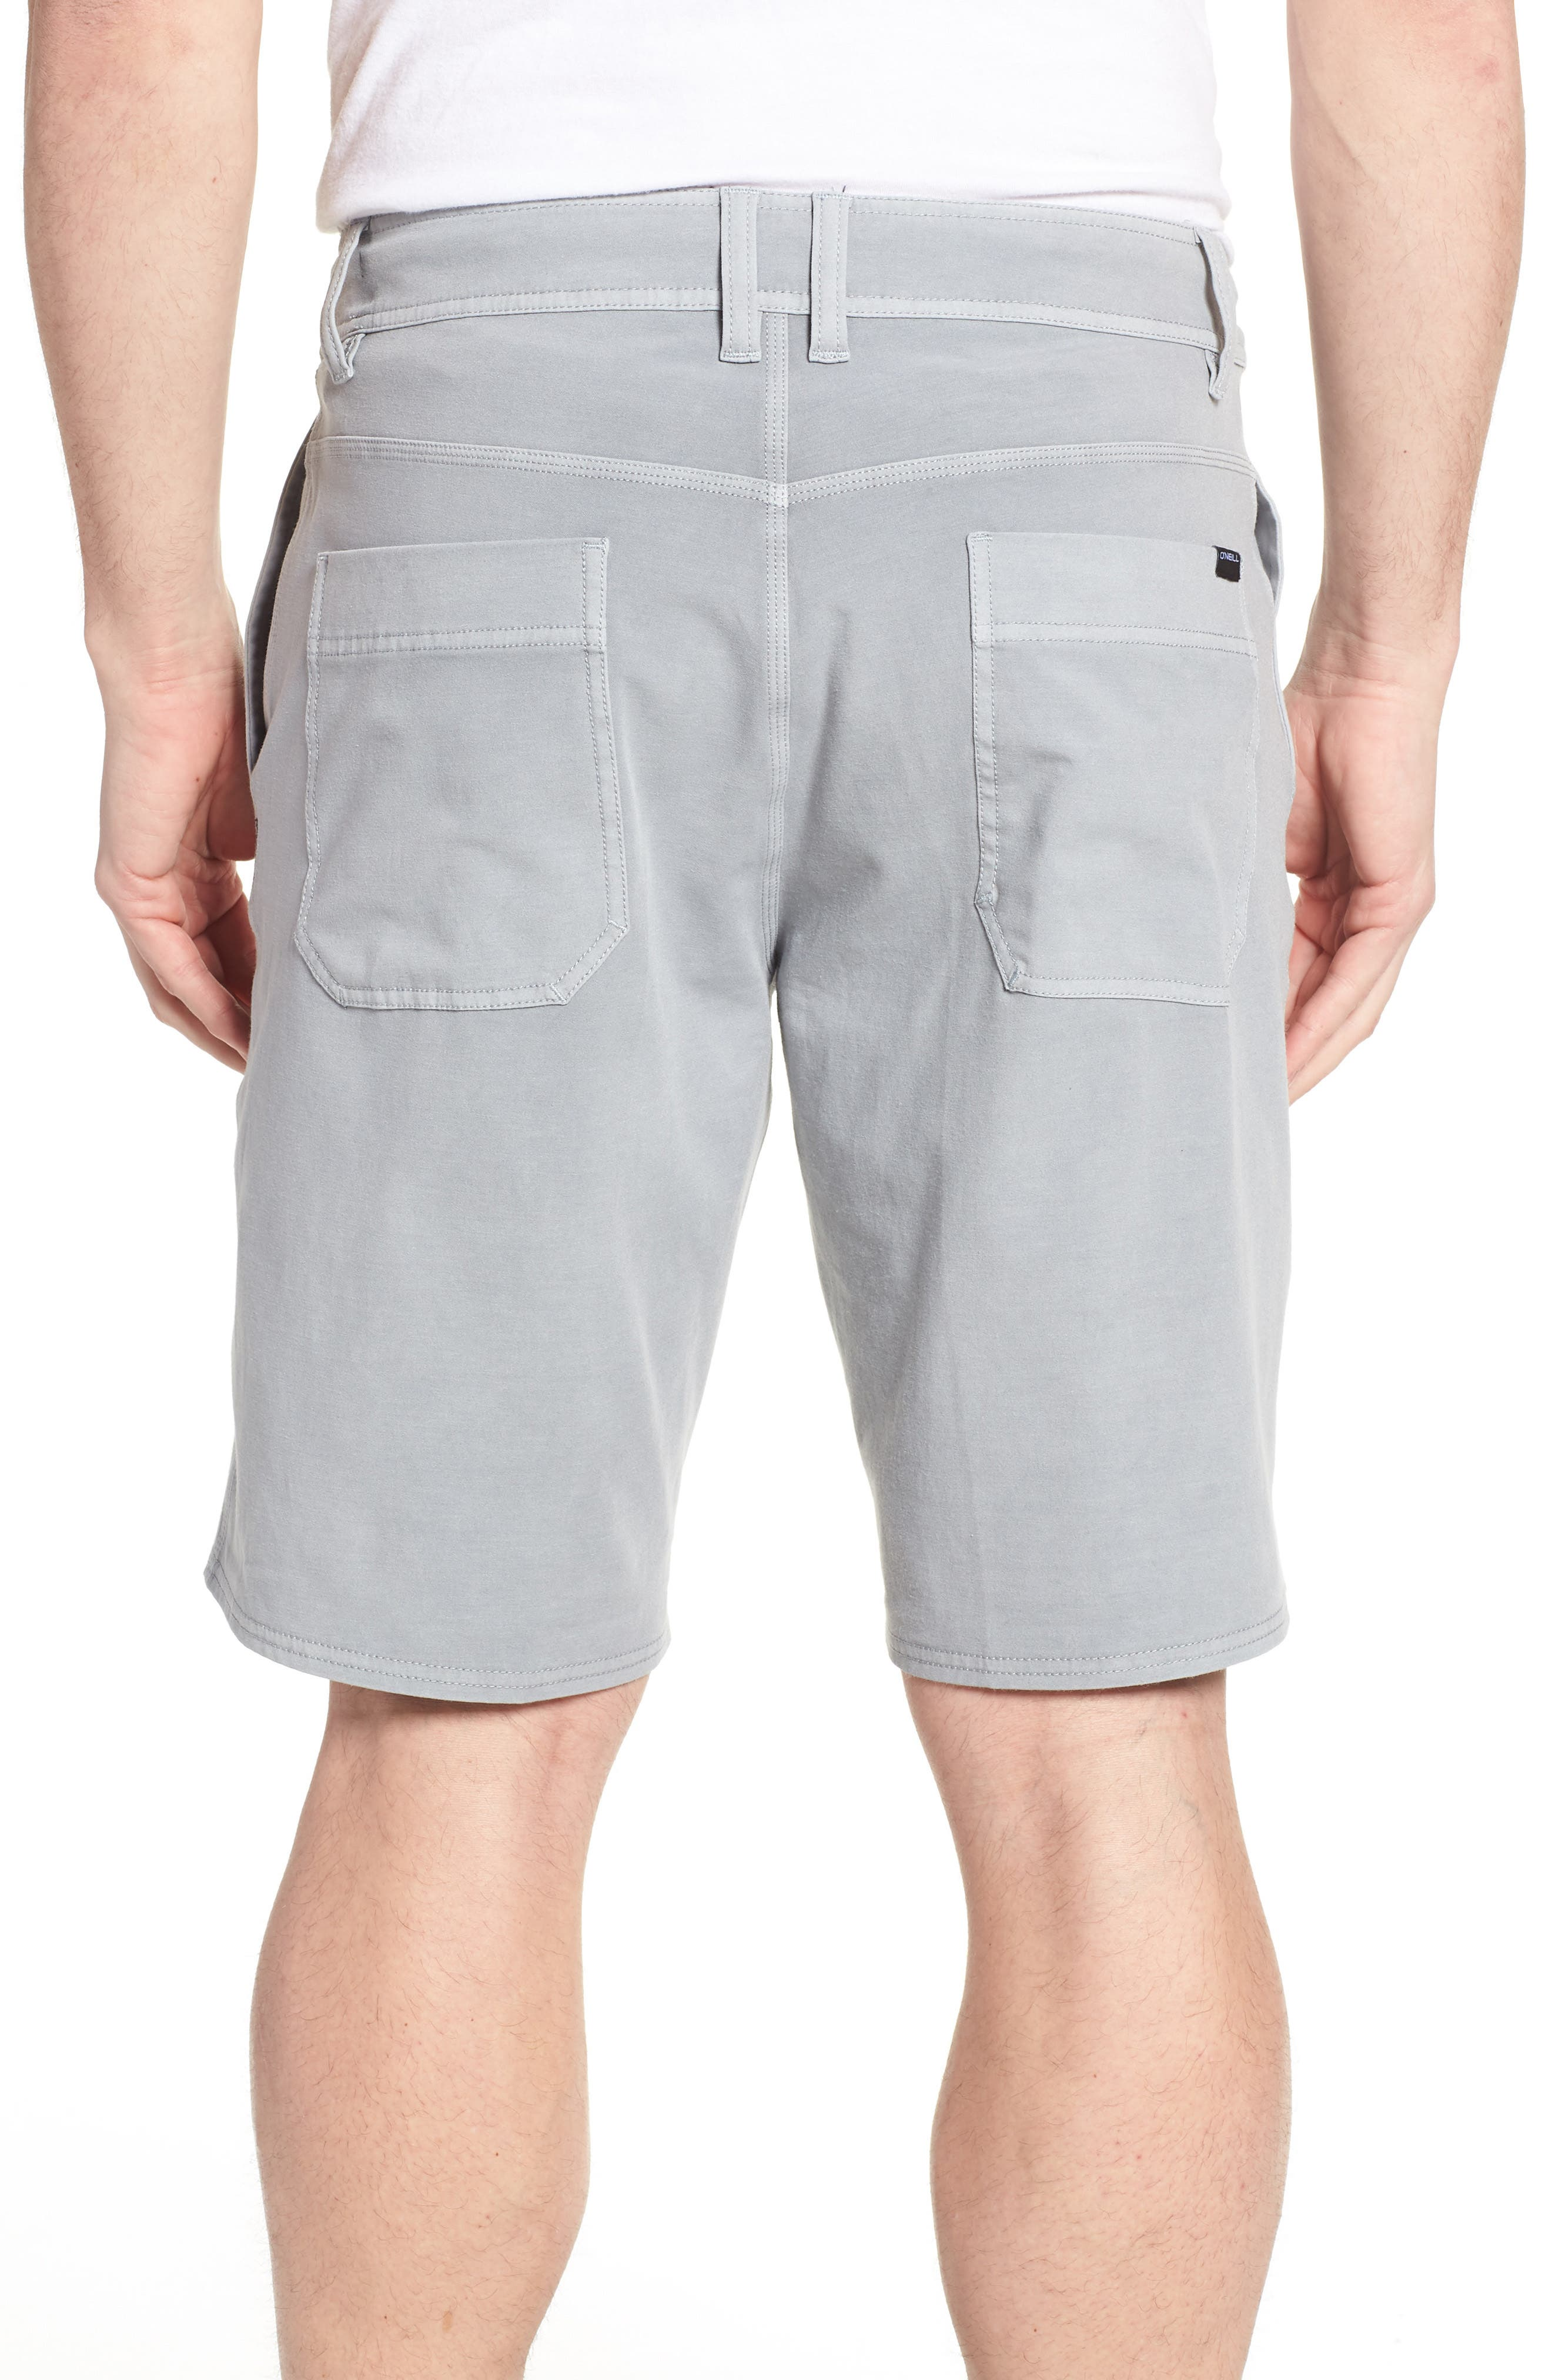 Venture Overdye Hybrid Shorts,                             Alternate thumbnail 2, color,                             039